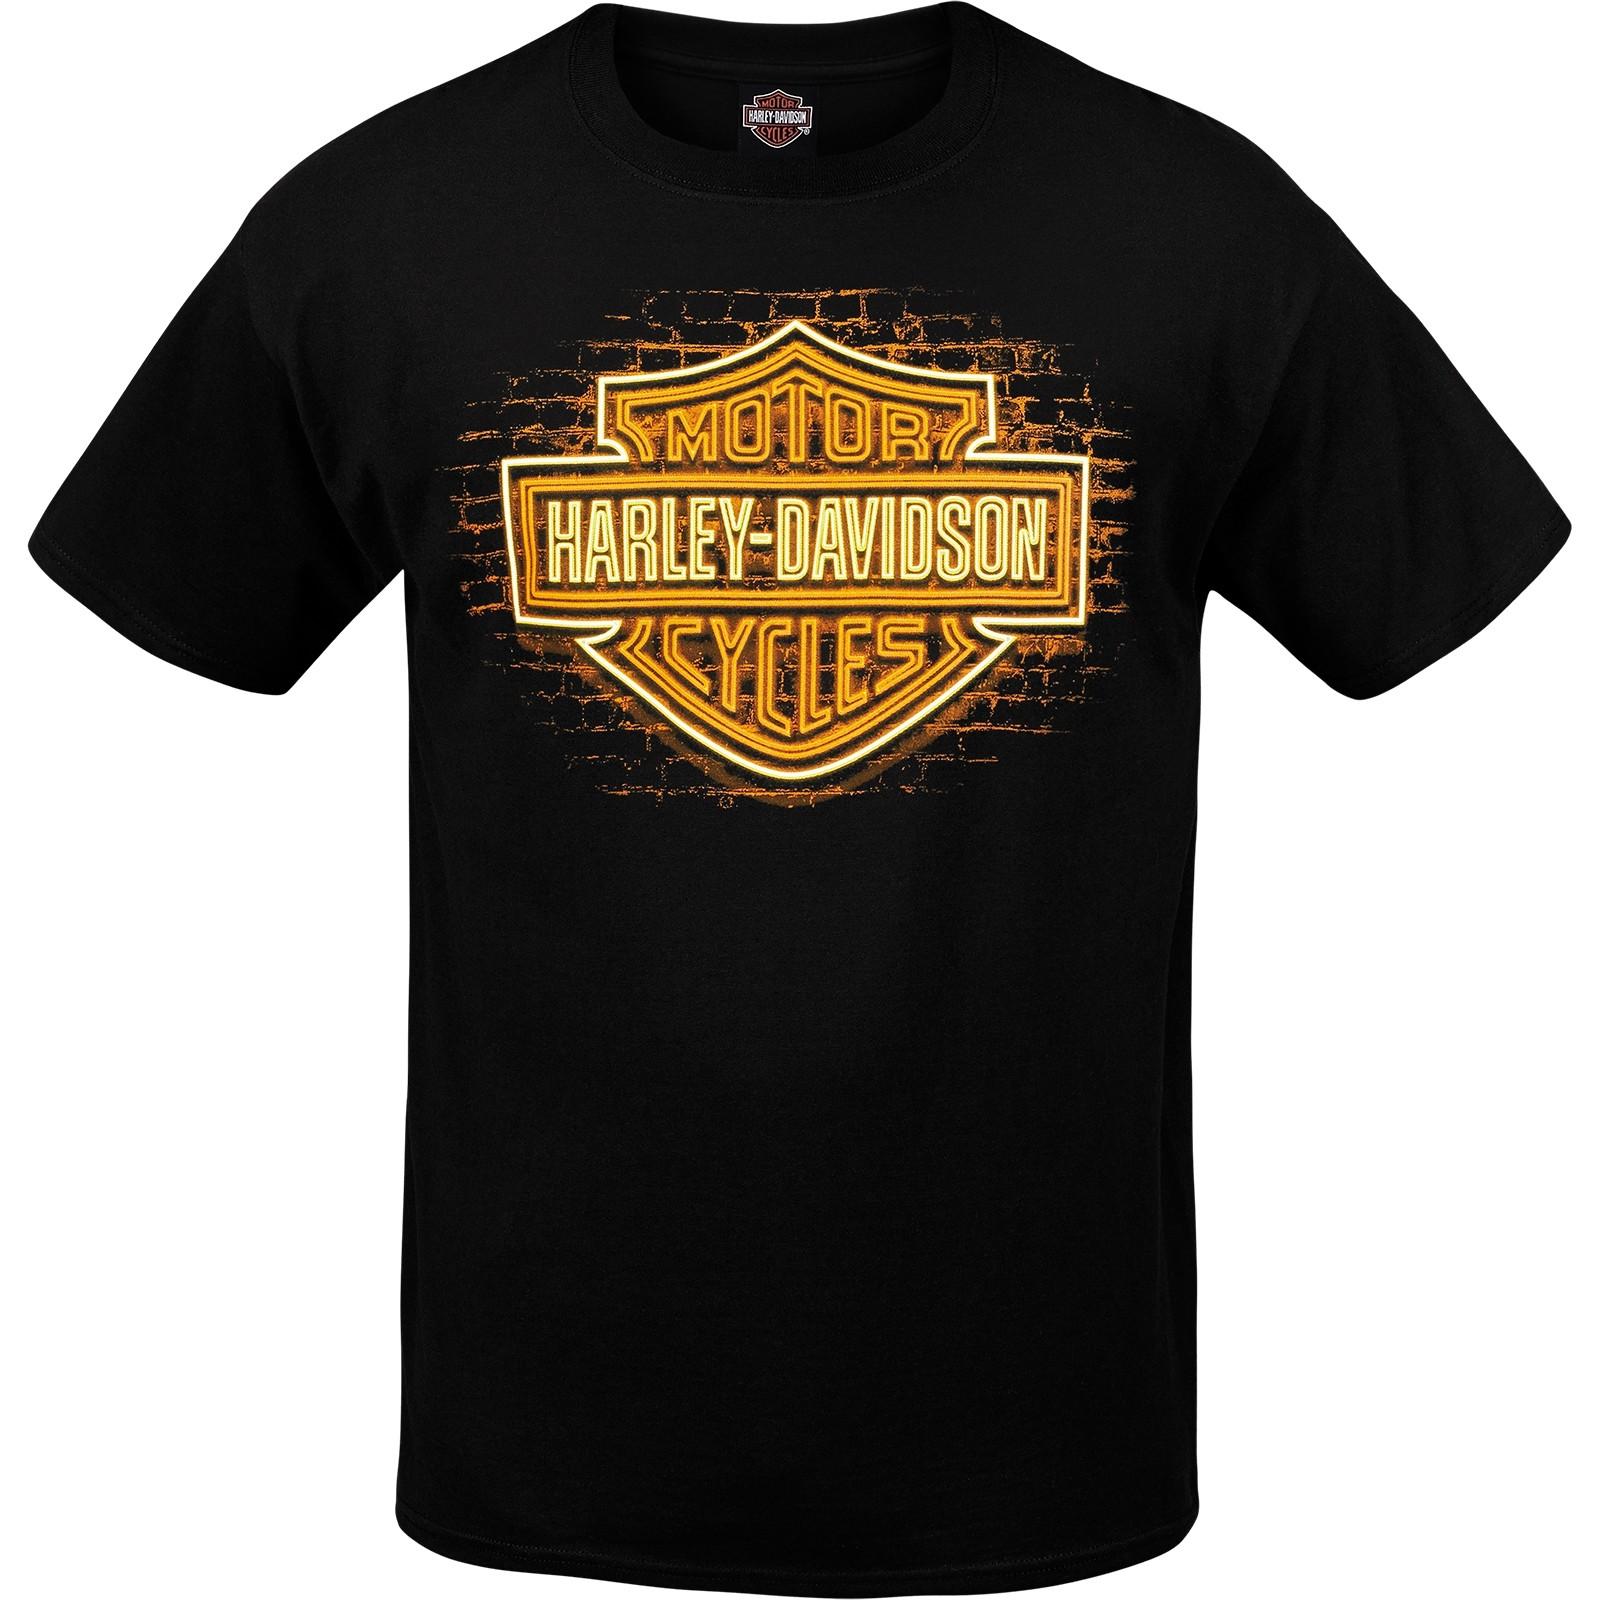 Harley Davidson Bar And Shield >> Harley Davidson Men S Graphic Bar And Shield T Shirt Usag Wiesbaden Bs Neon